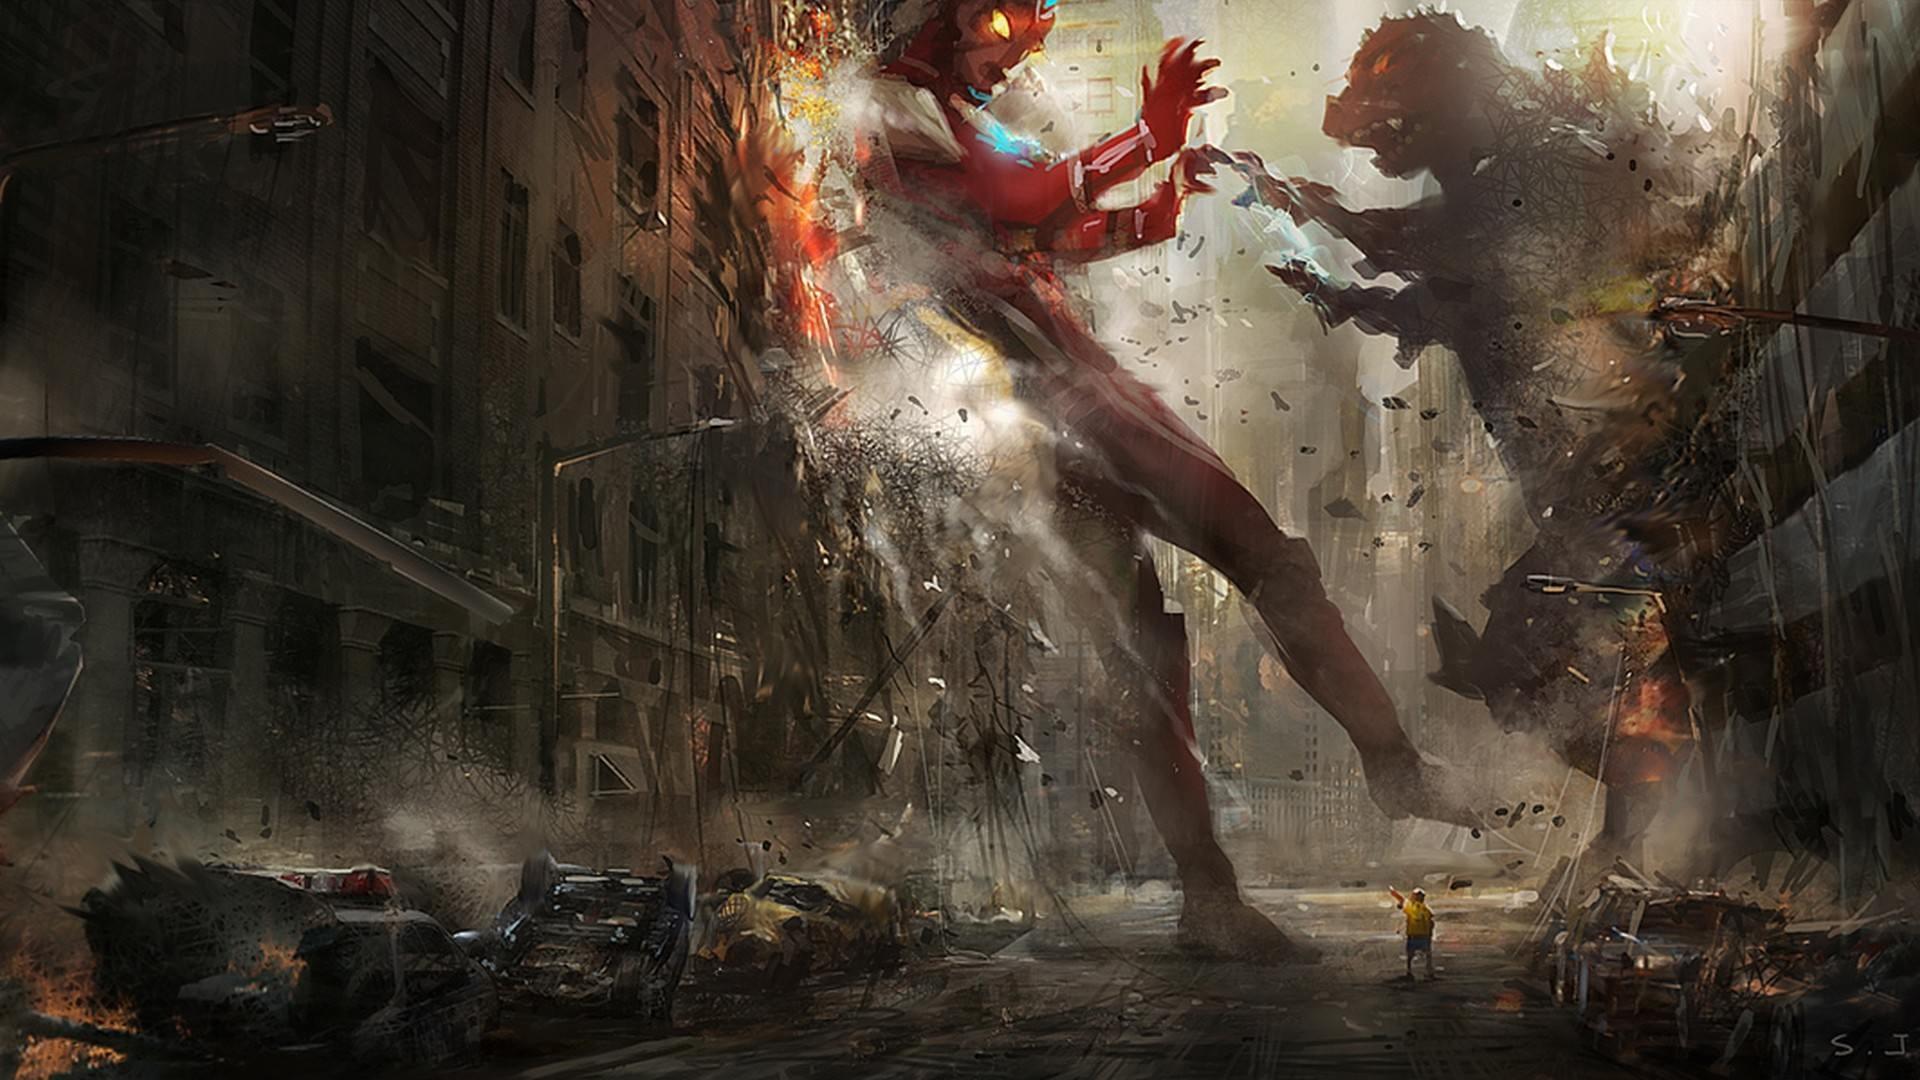 Godzilla vs Ultraman Wallpaper